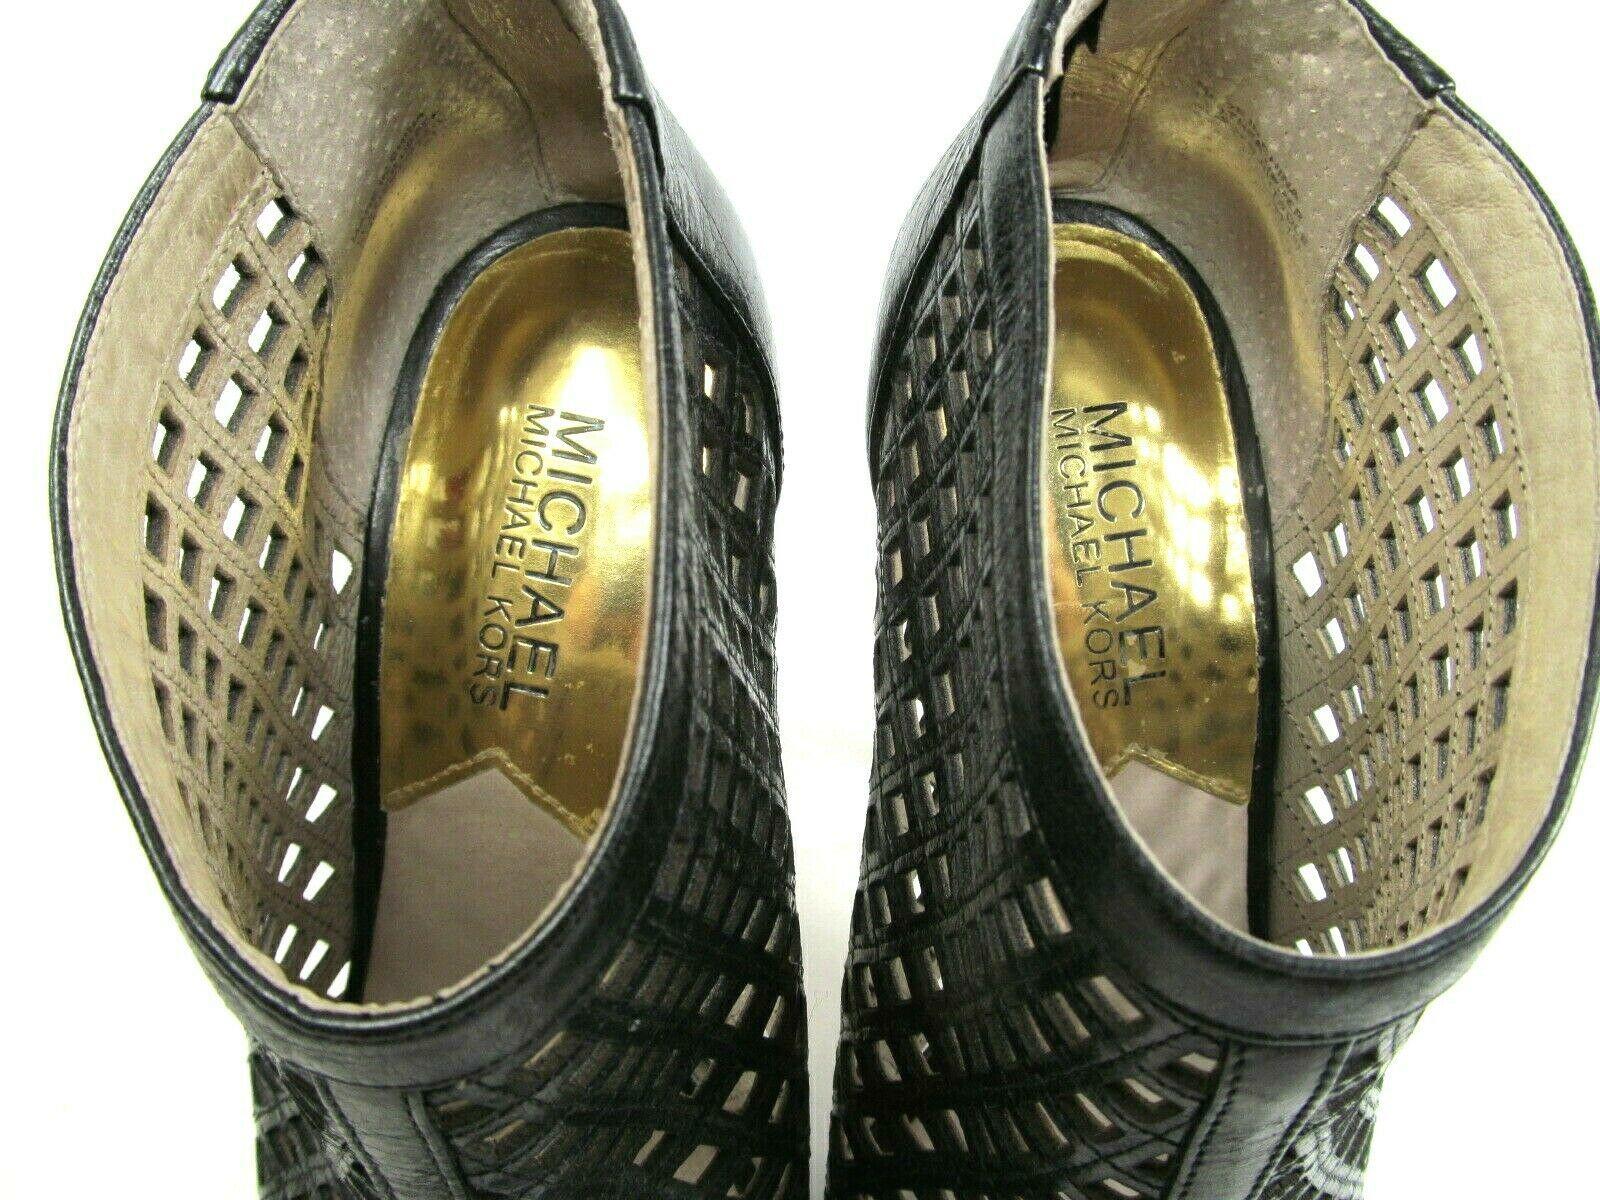 Michael Kors Womens Peep Toe Stilettos Platforms With Cutouts Size US 6 M image 7